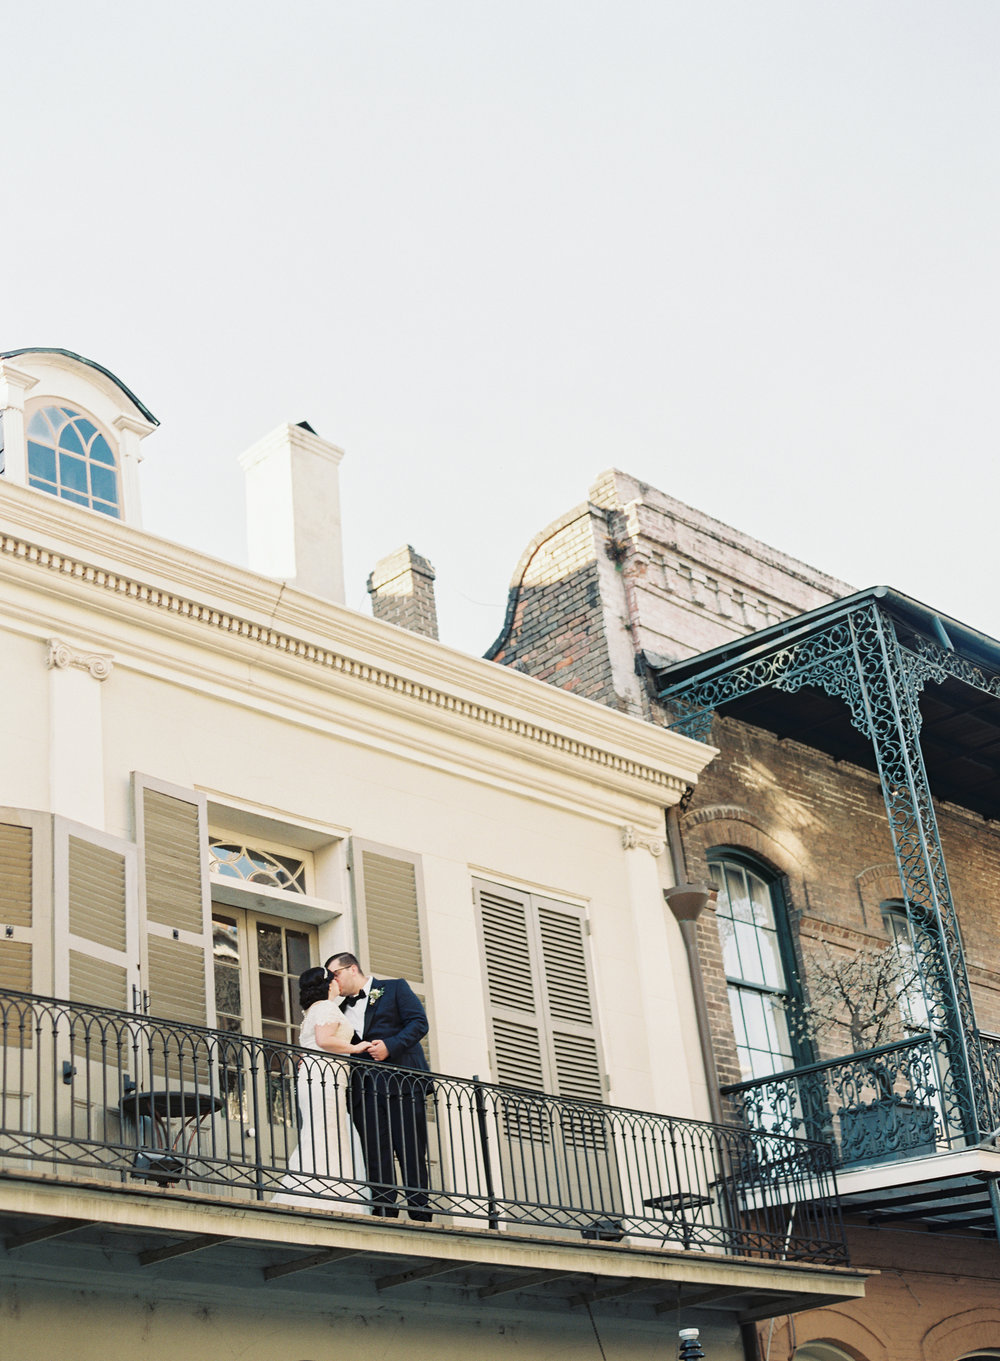 romantic wedding in new orleans